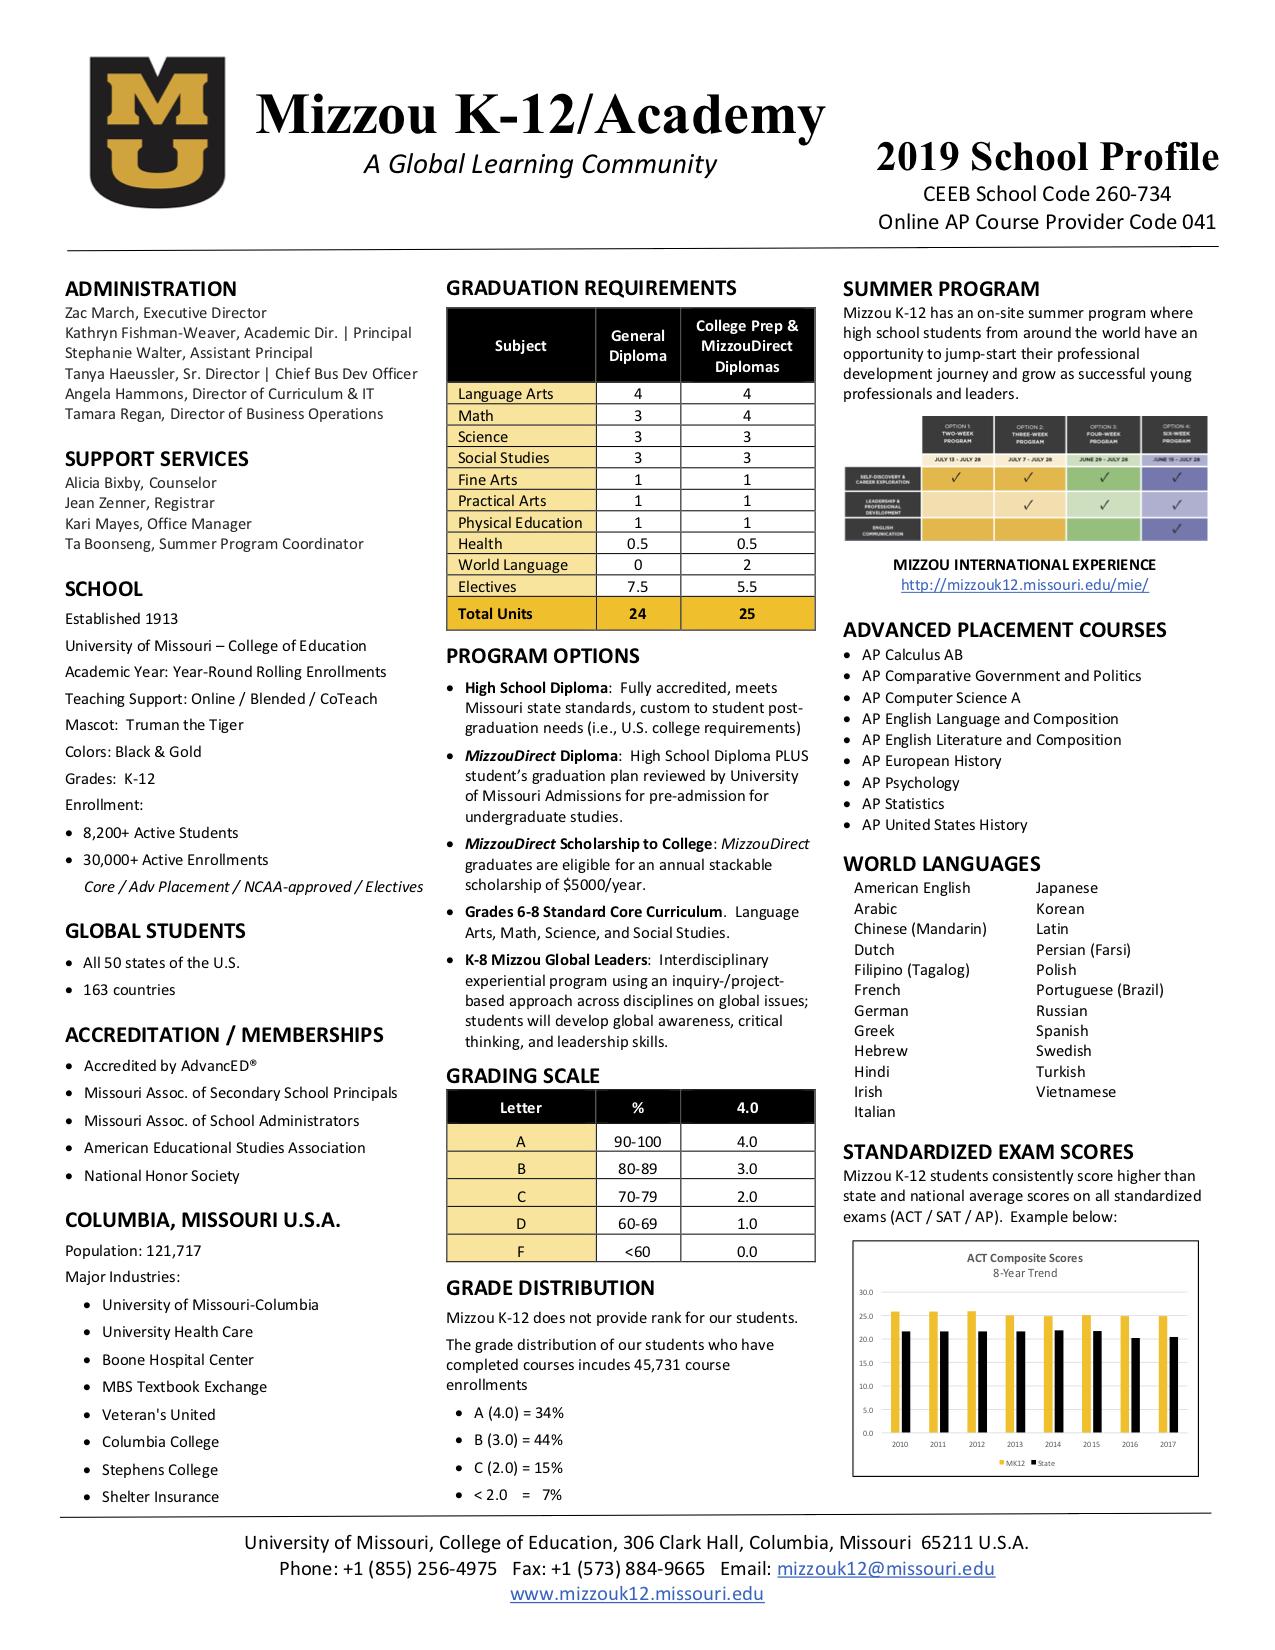 2019 School Profile Page 1